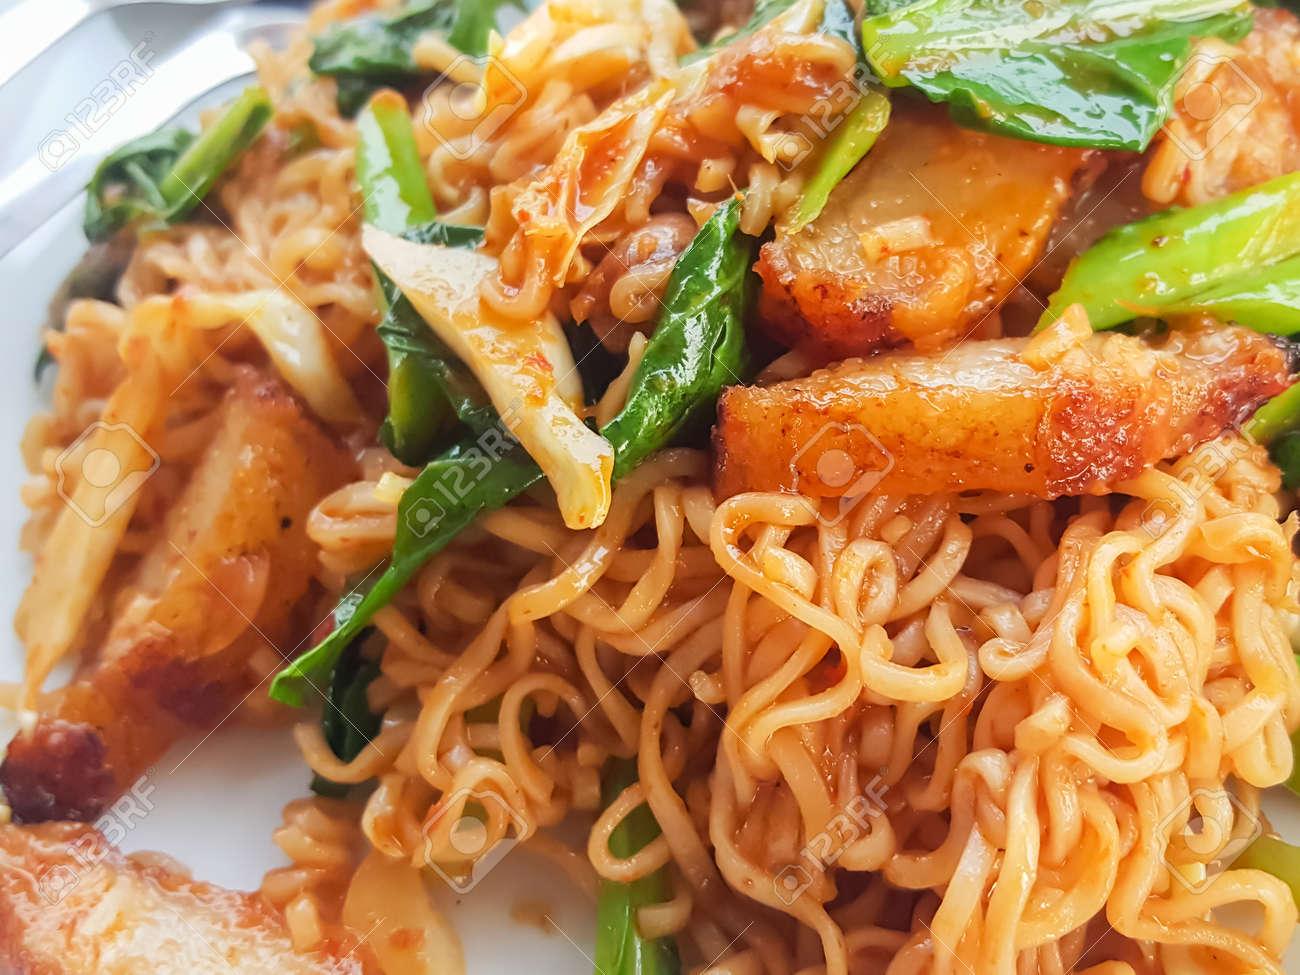 Thai food stlye:Spicy Stir fried instant noodle &fried pork curry